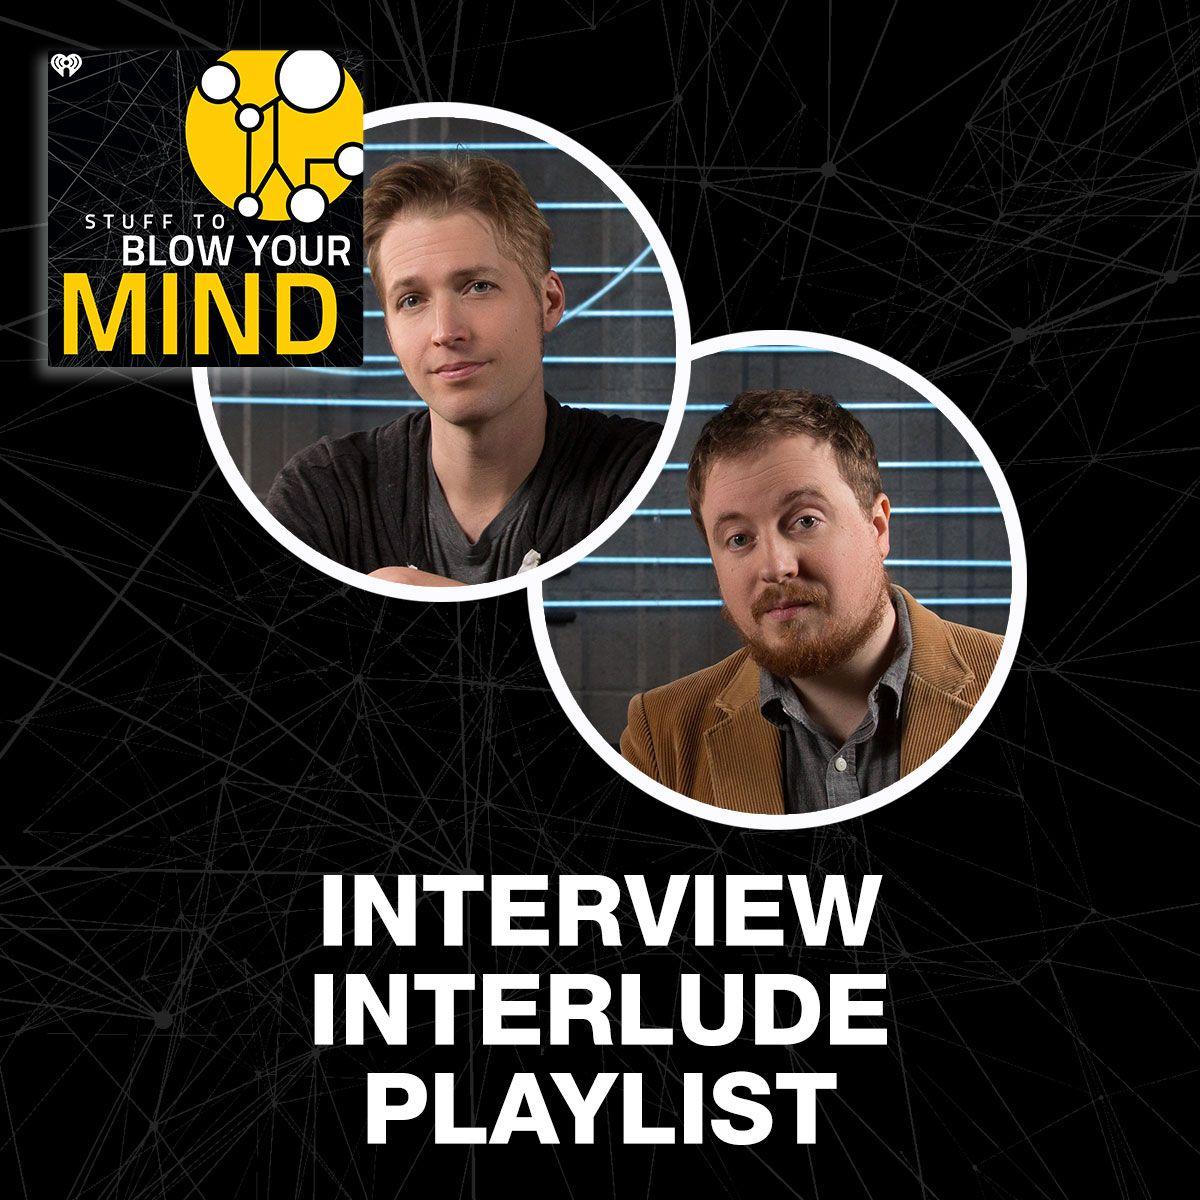 Interview Interlude Playlist, Part 7: R. Scott Bakker